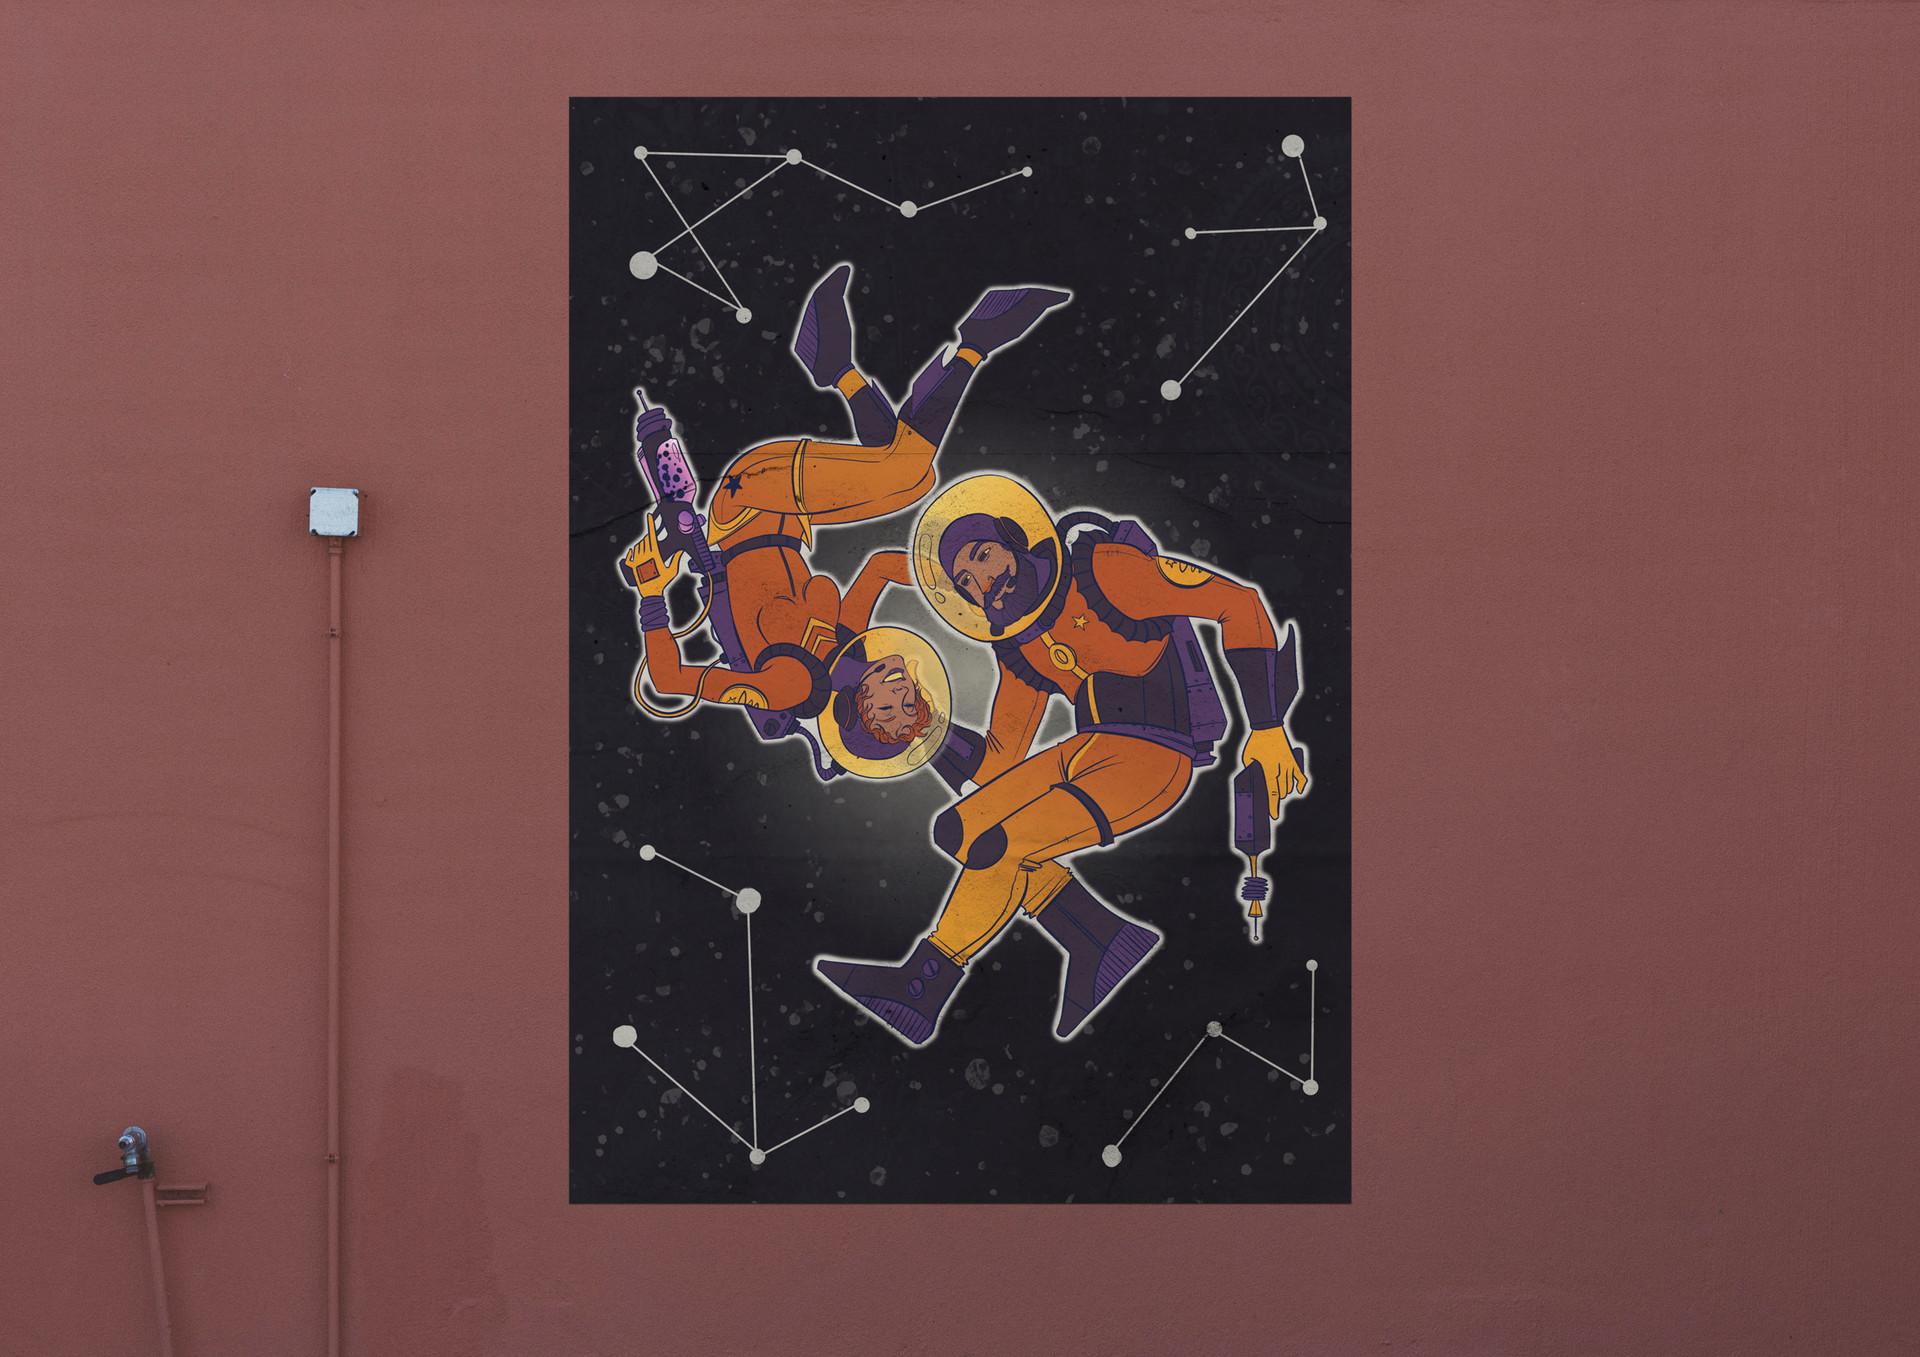 retro astronaut posters - HD1920×1357